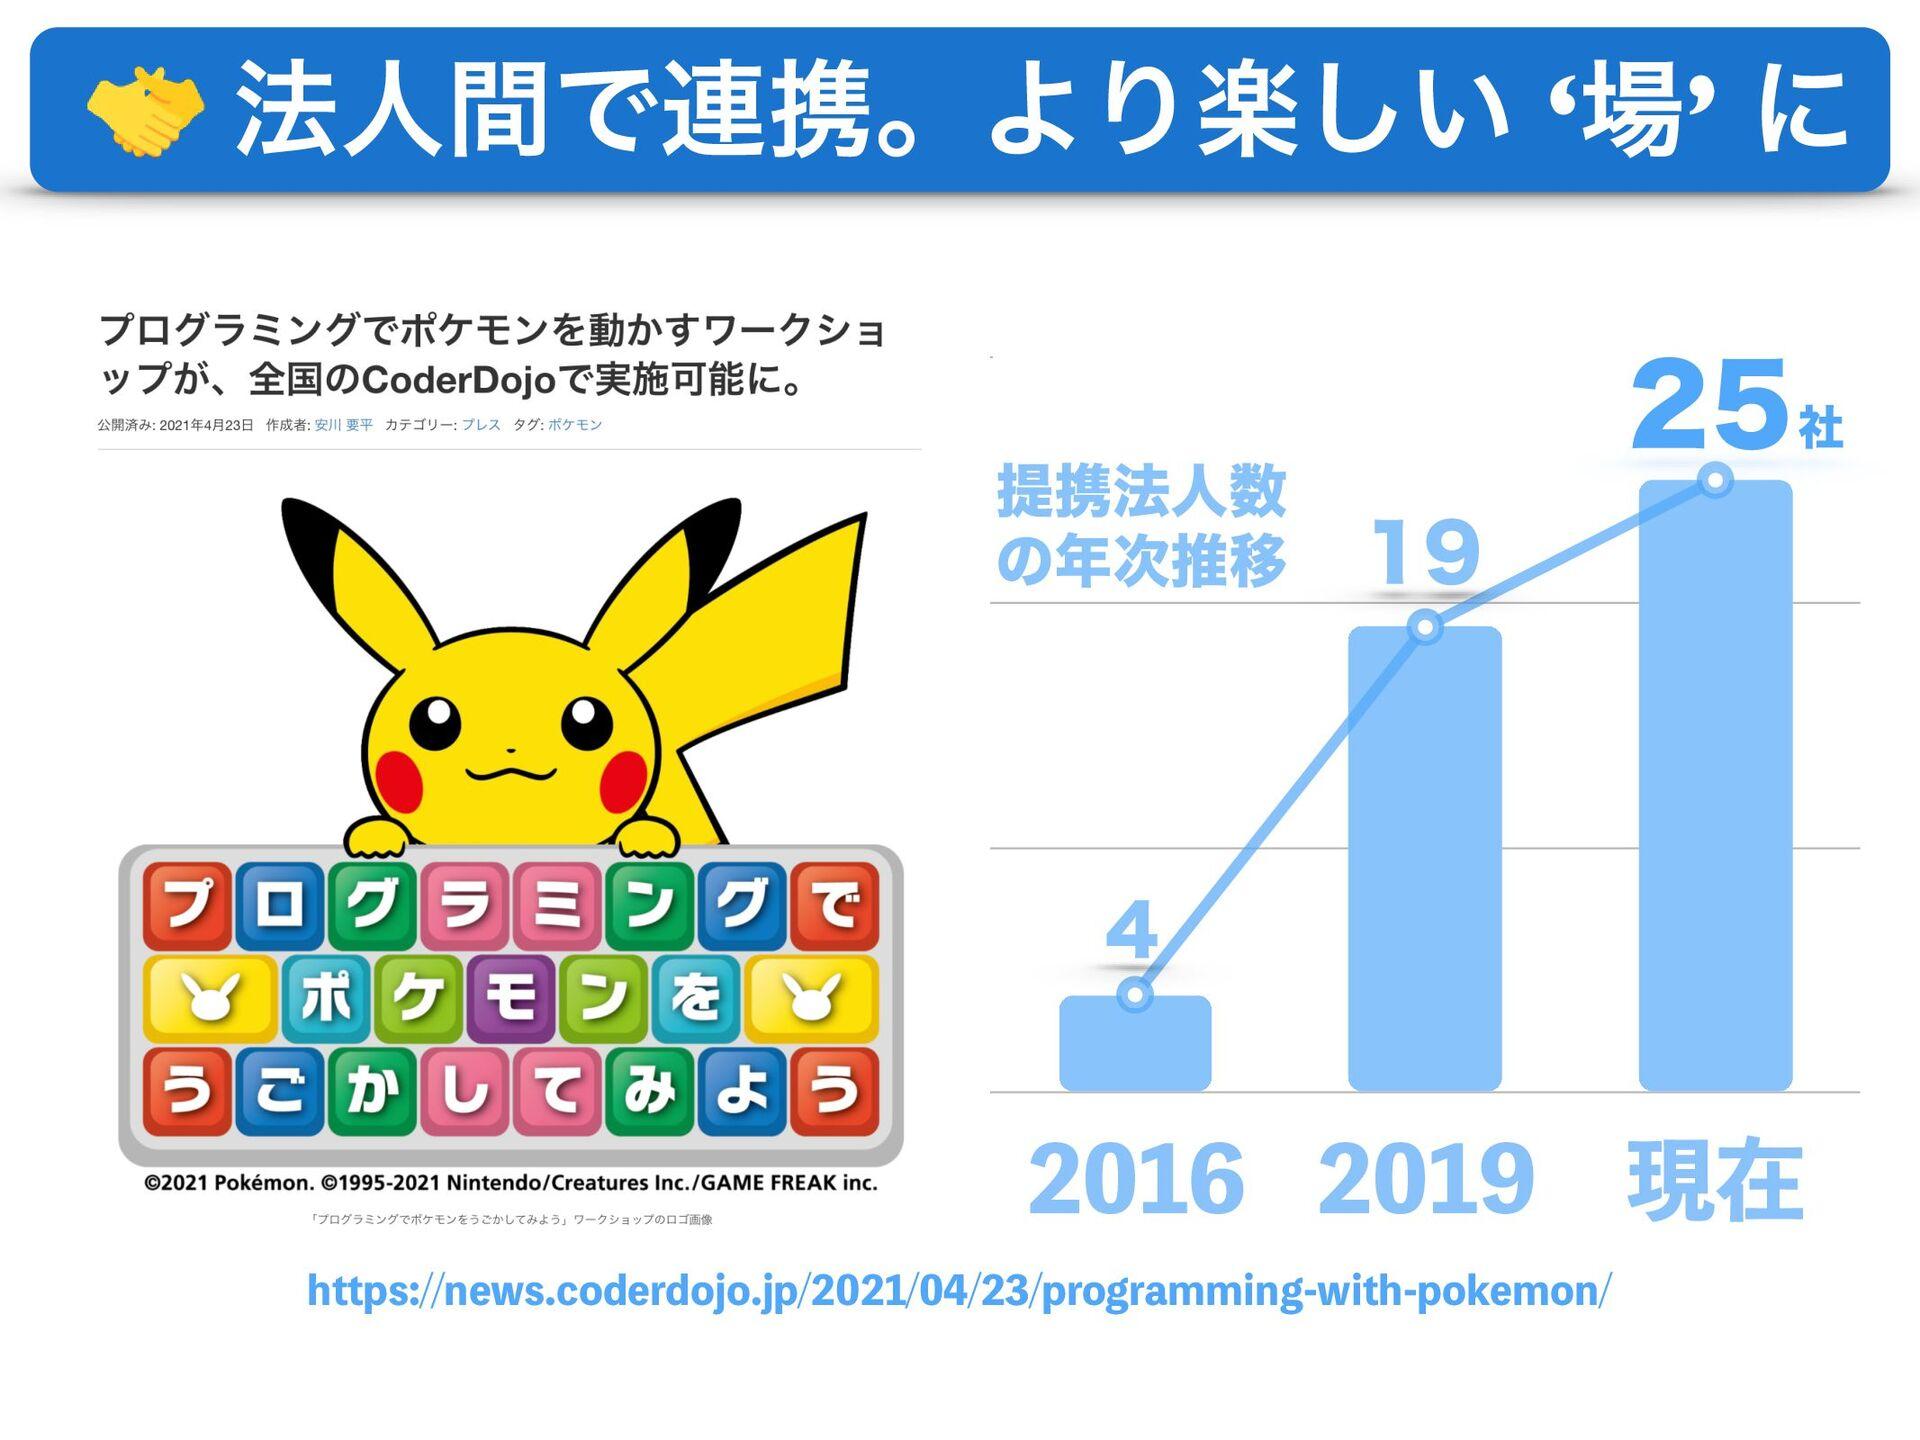 https://news.coderdojo.jp/2018/11/28/from-cygam...